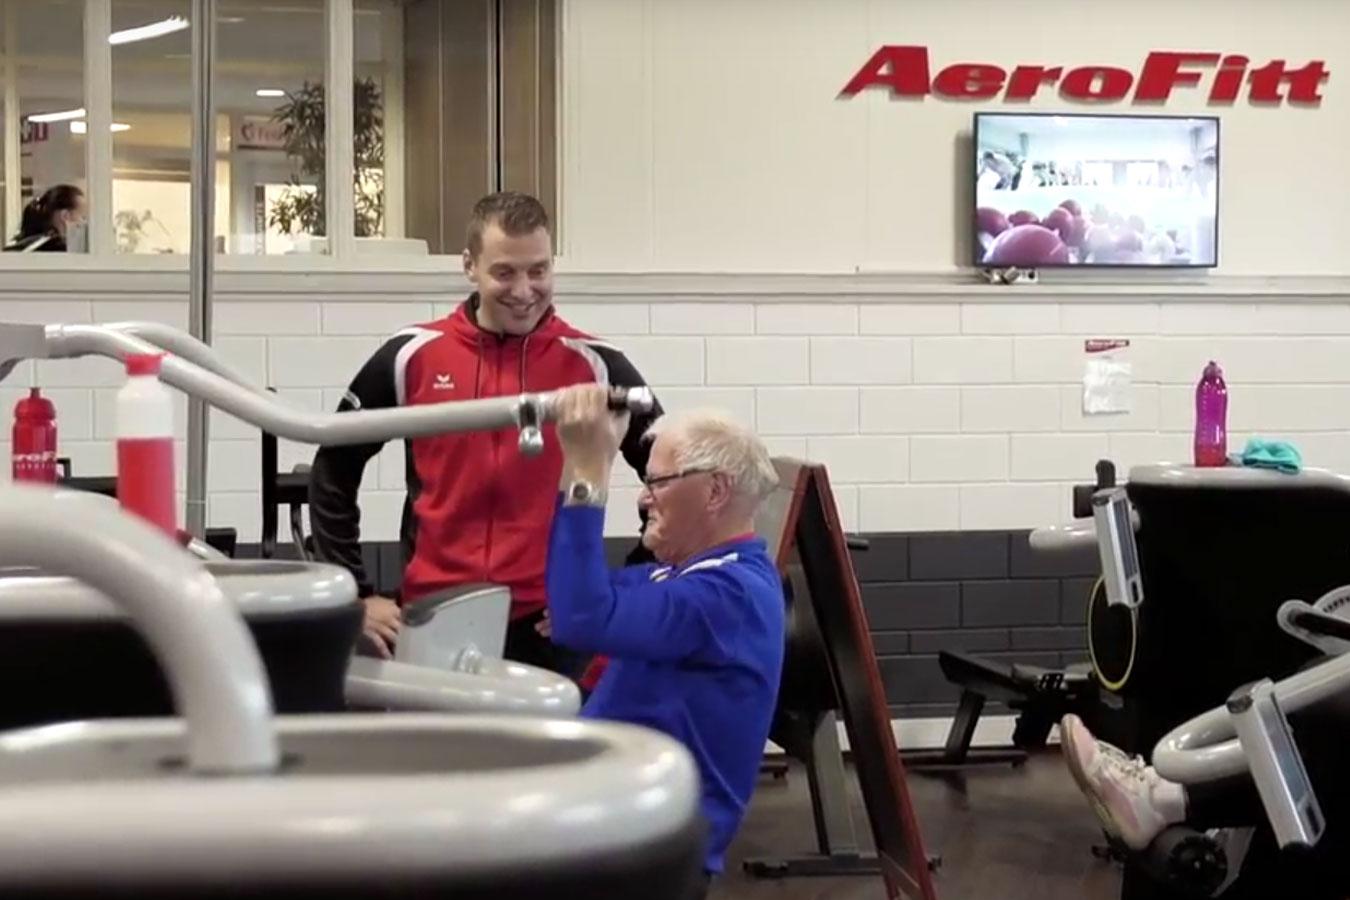 AeroFitt Sponsor Liemerse Sportprijs 2018!